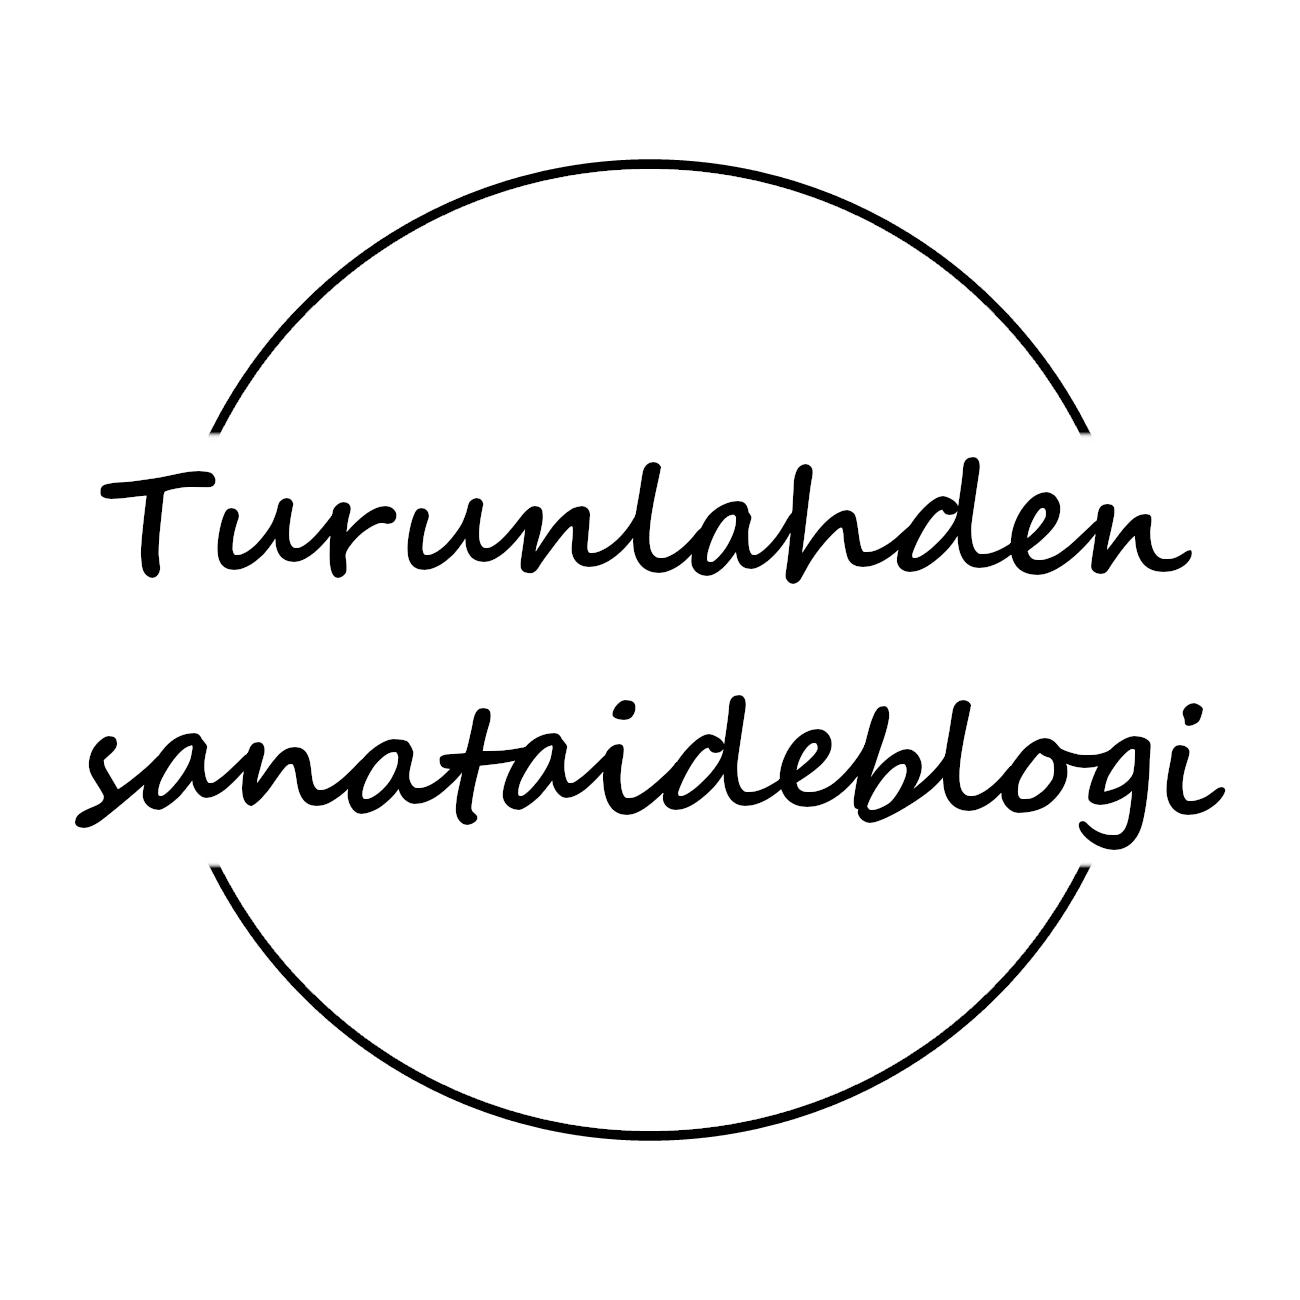 sanataideblogilogo1200